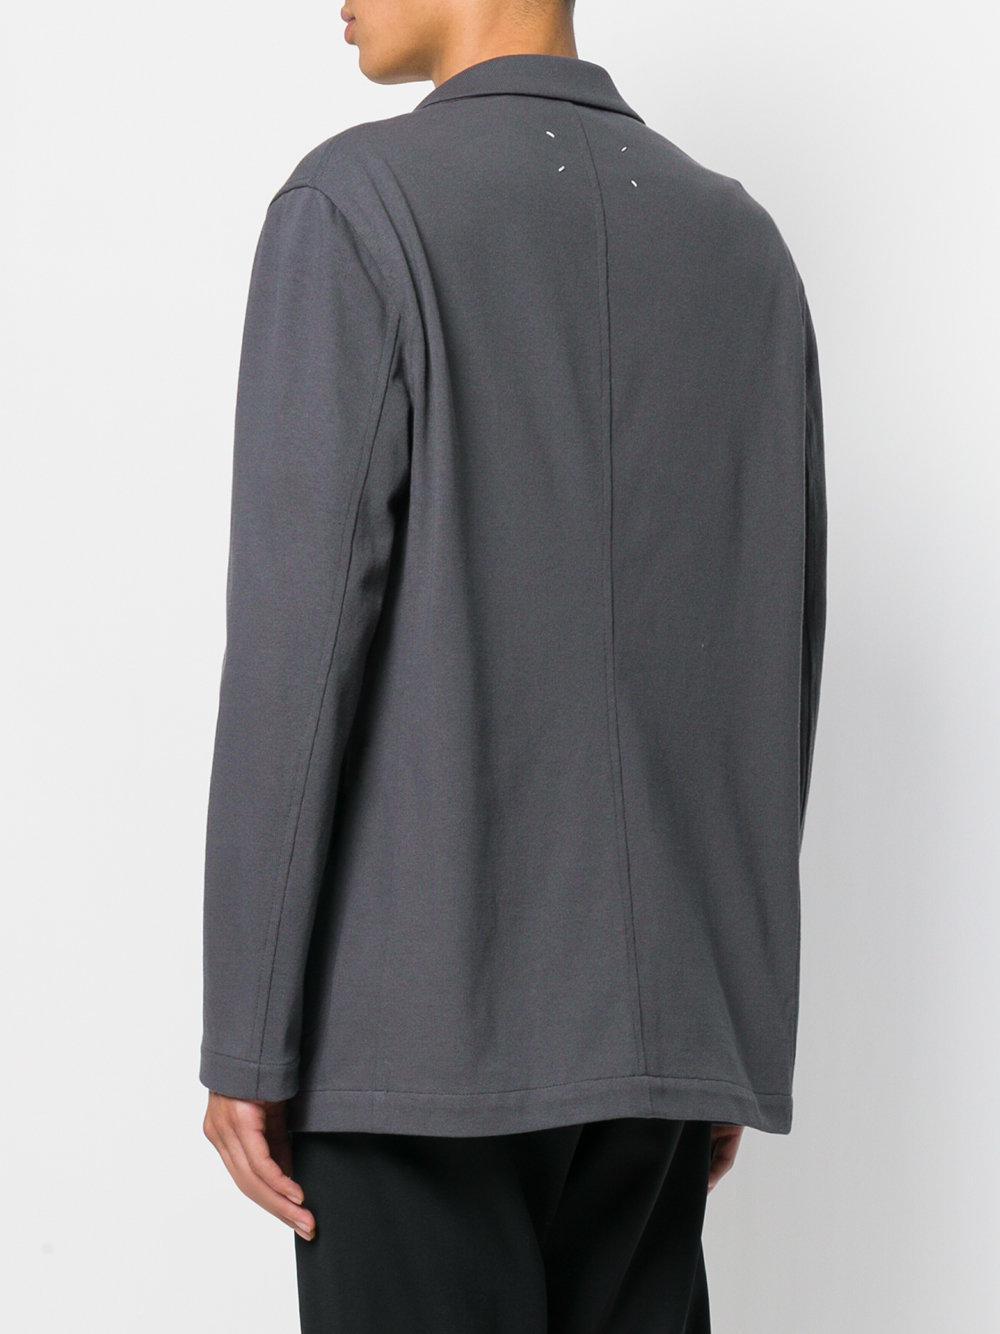 Maison Margiela Cotton Relaxed Blazer Jacket in Grey (Grey) for Men